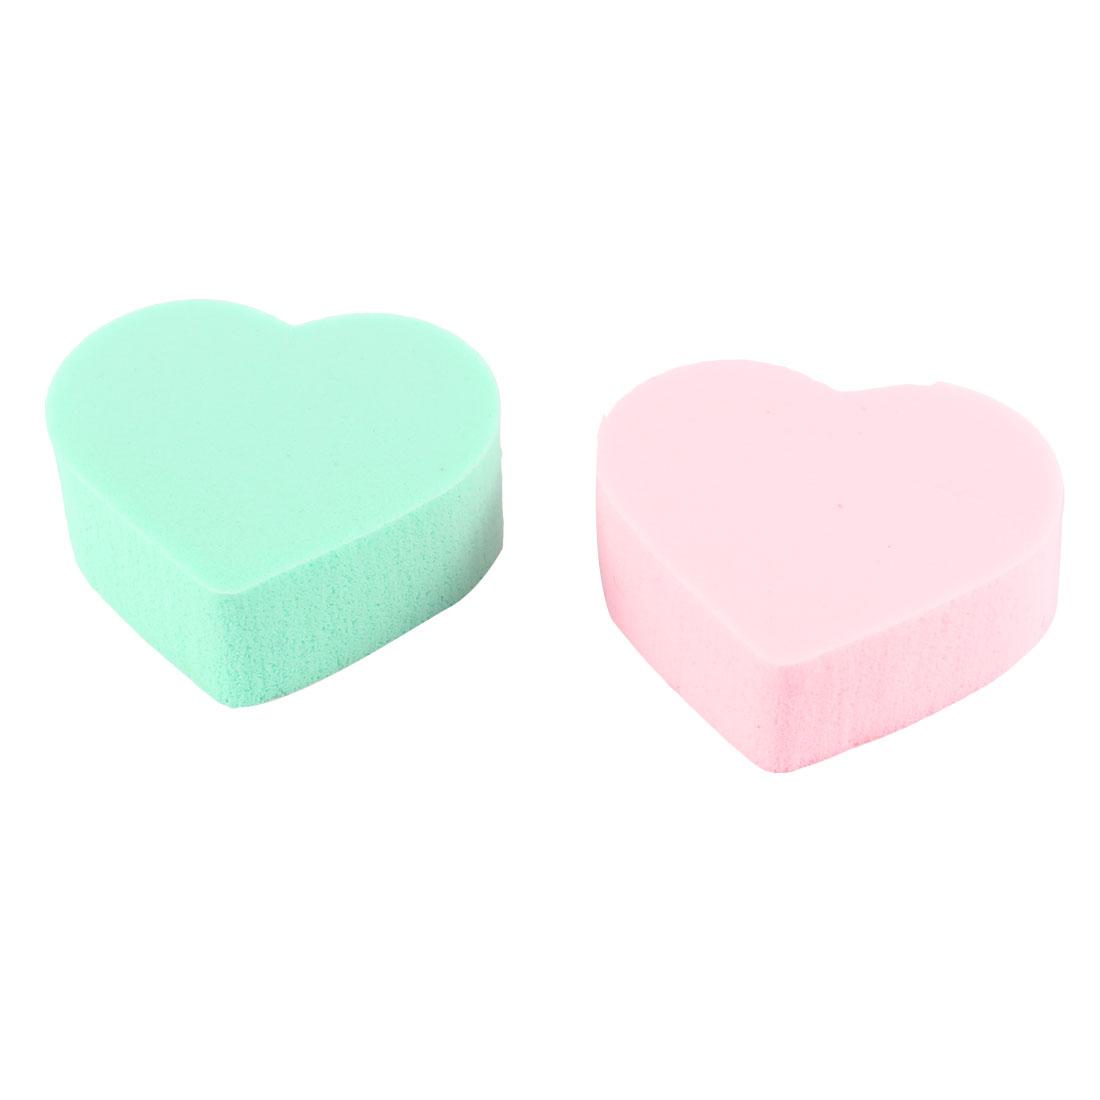 Lady Women Green Pink Sponge Facial Cleaner Powder Pads 2 Pcs